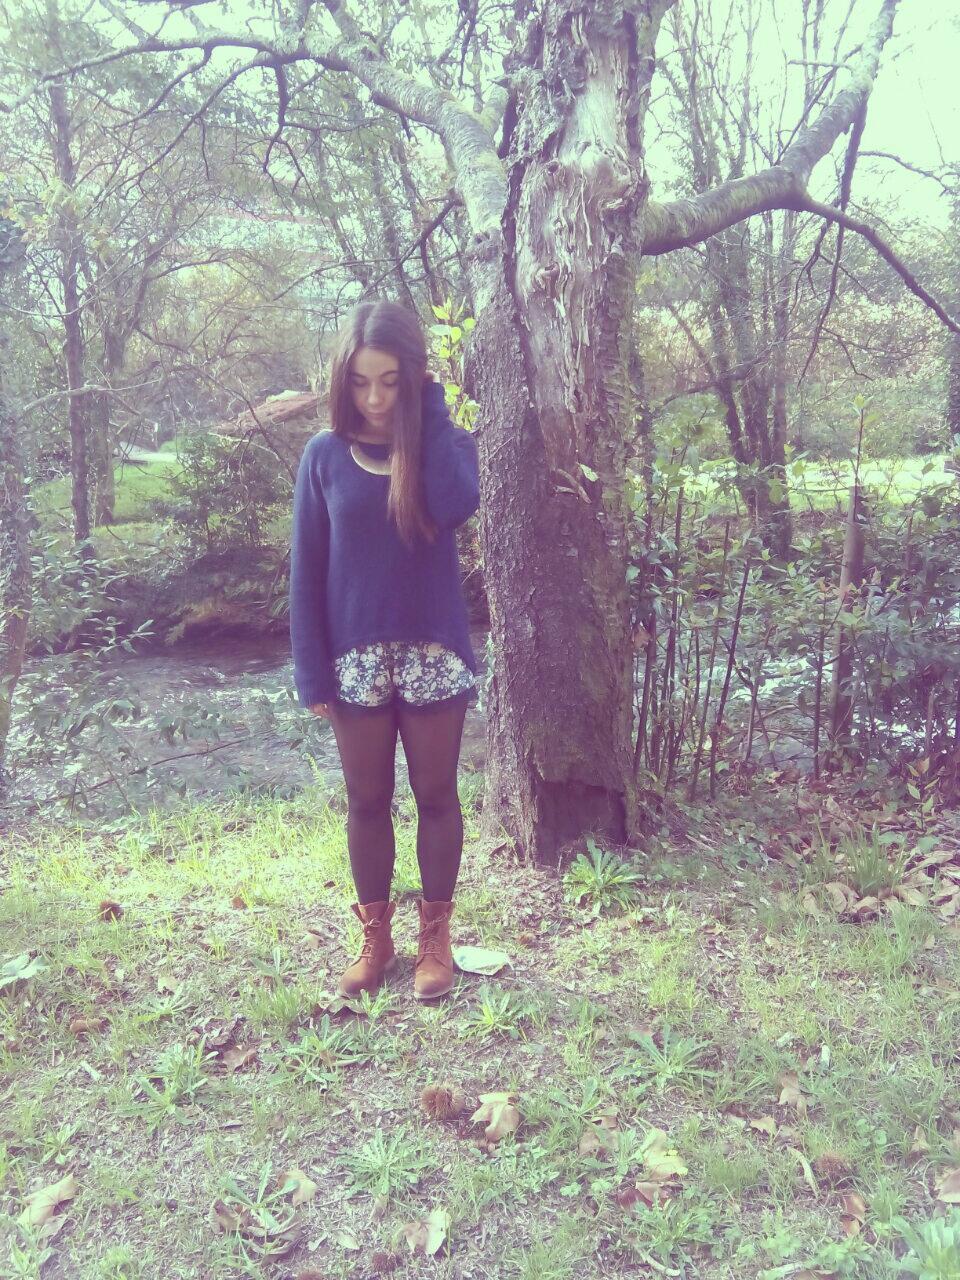 Autumn is already here.-7-luciaseijas